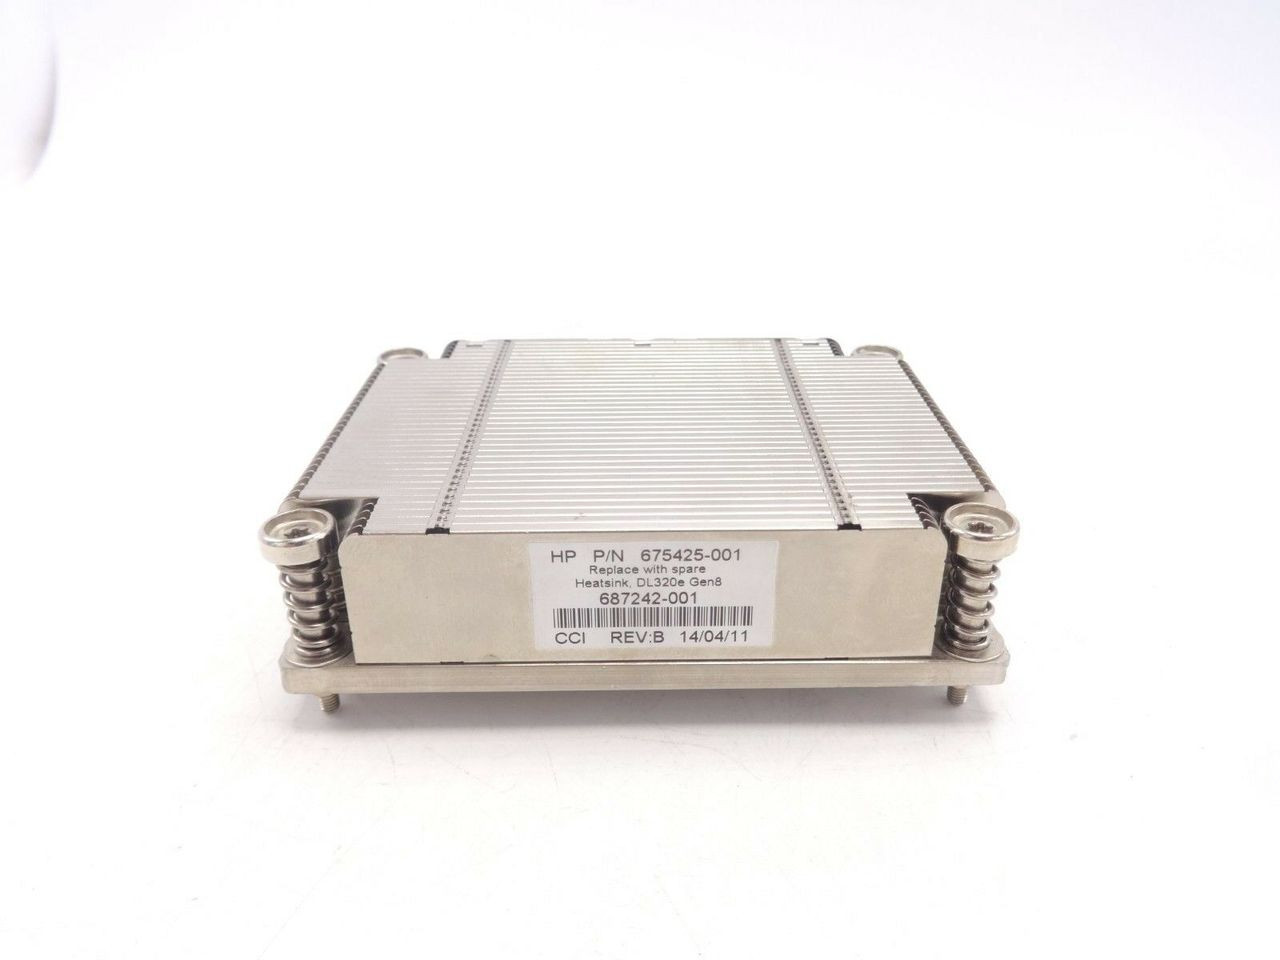 HP 687242-001 DL320 G8 Heatsink 675425-001